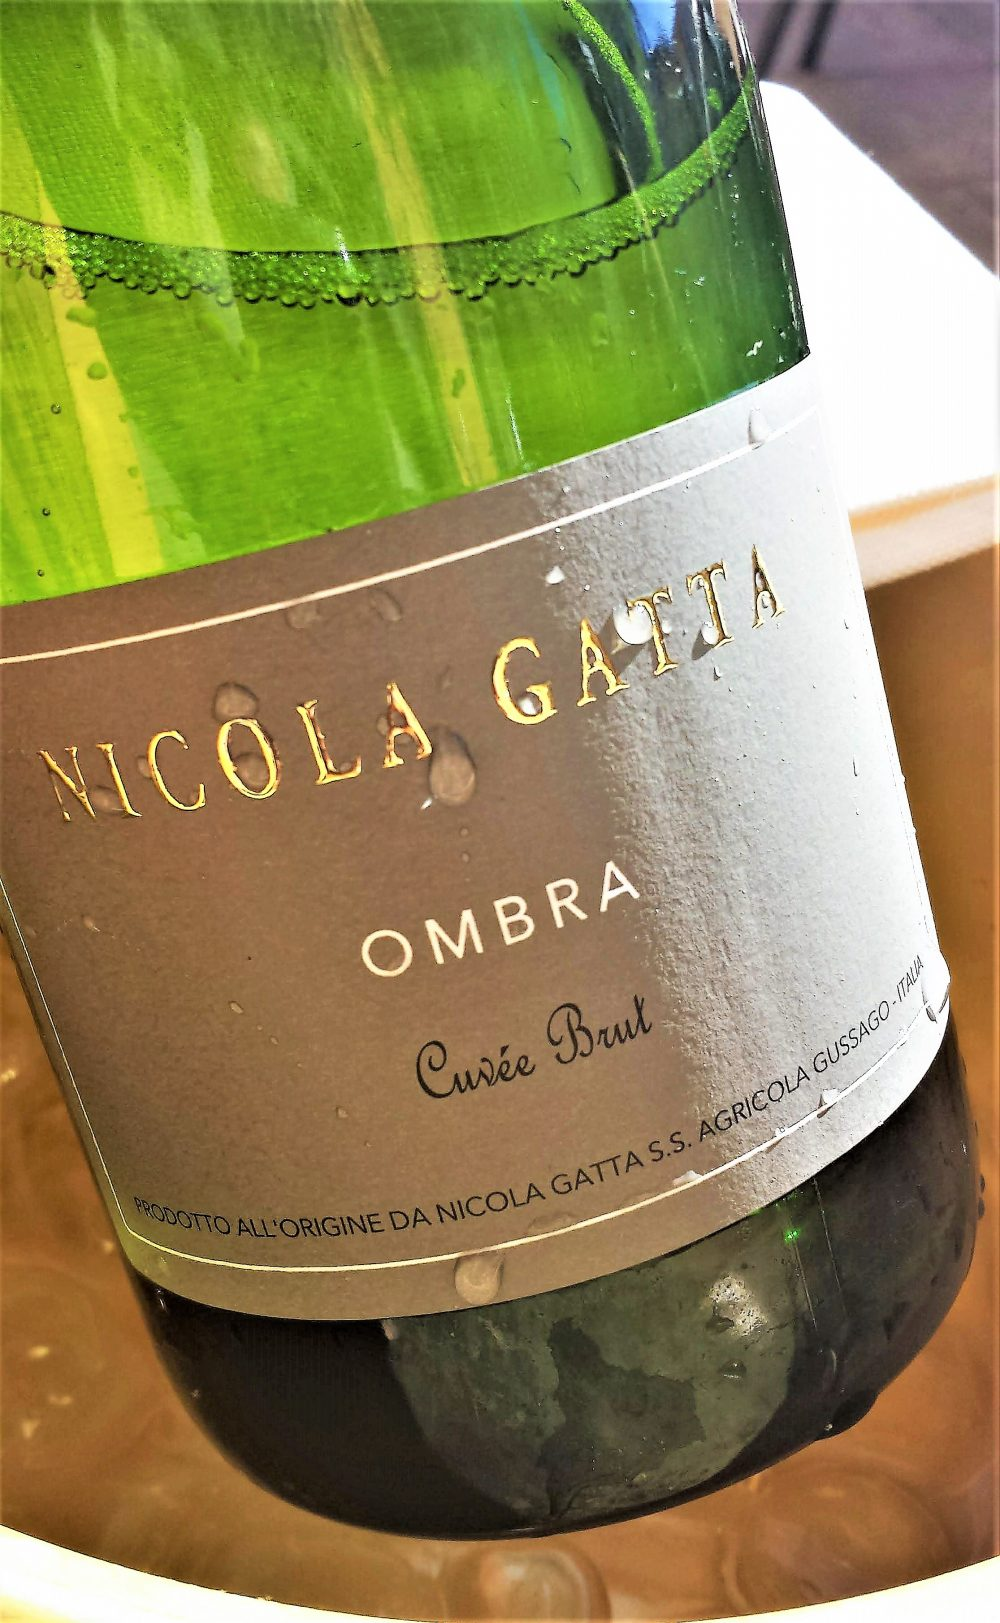 Franciacorta Ombra Cuvee Brut, Nicola Gatta